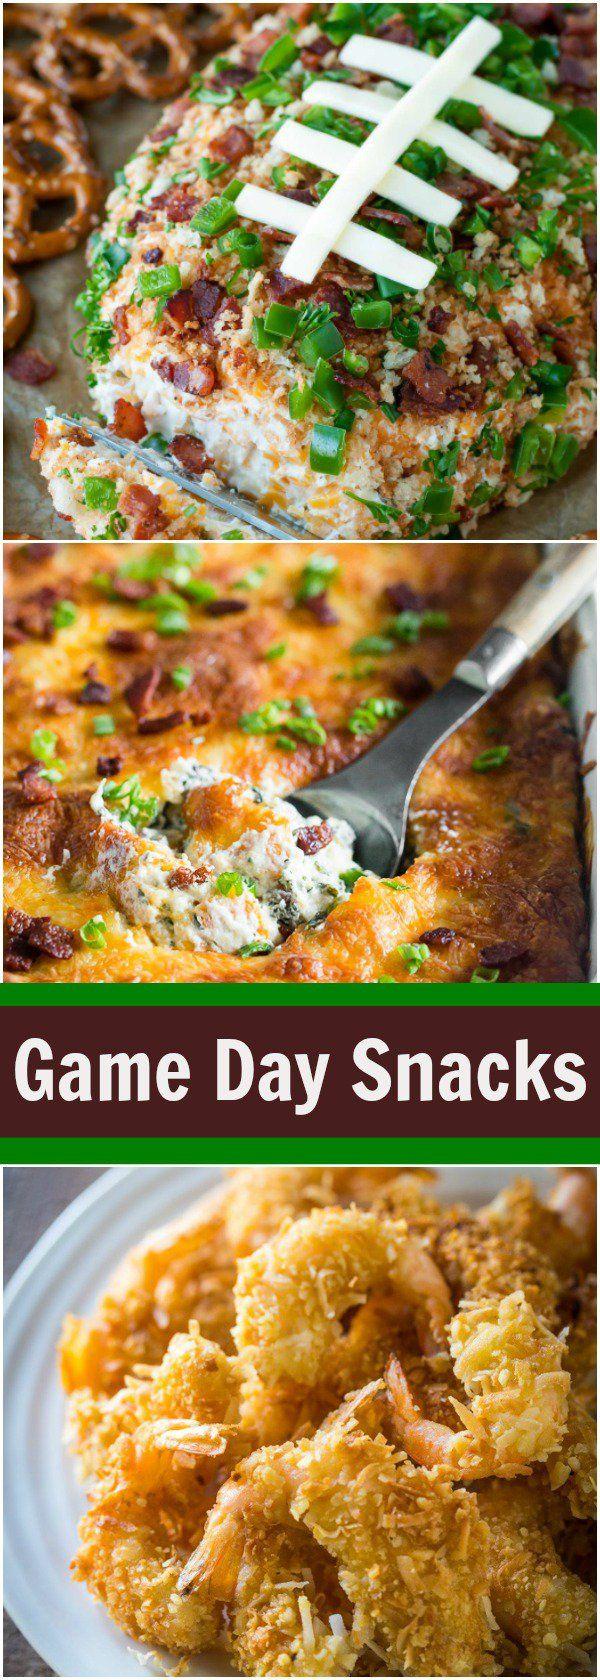 18-winning-game-day-snacks